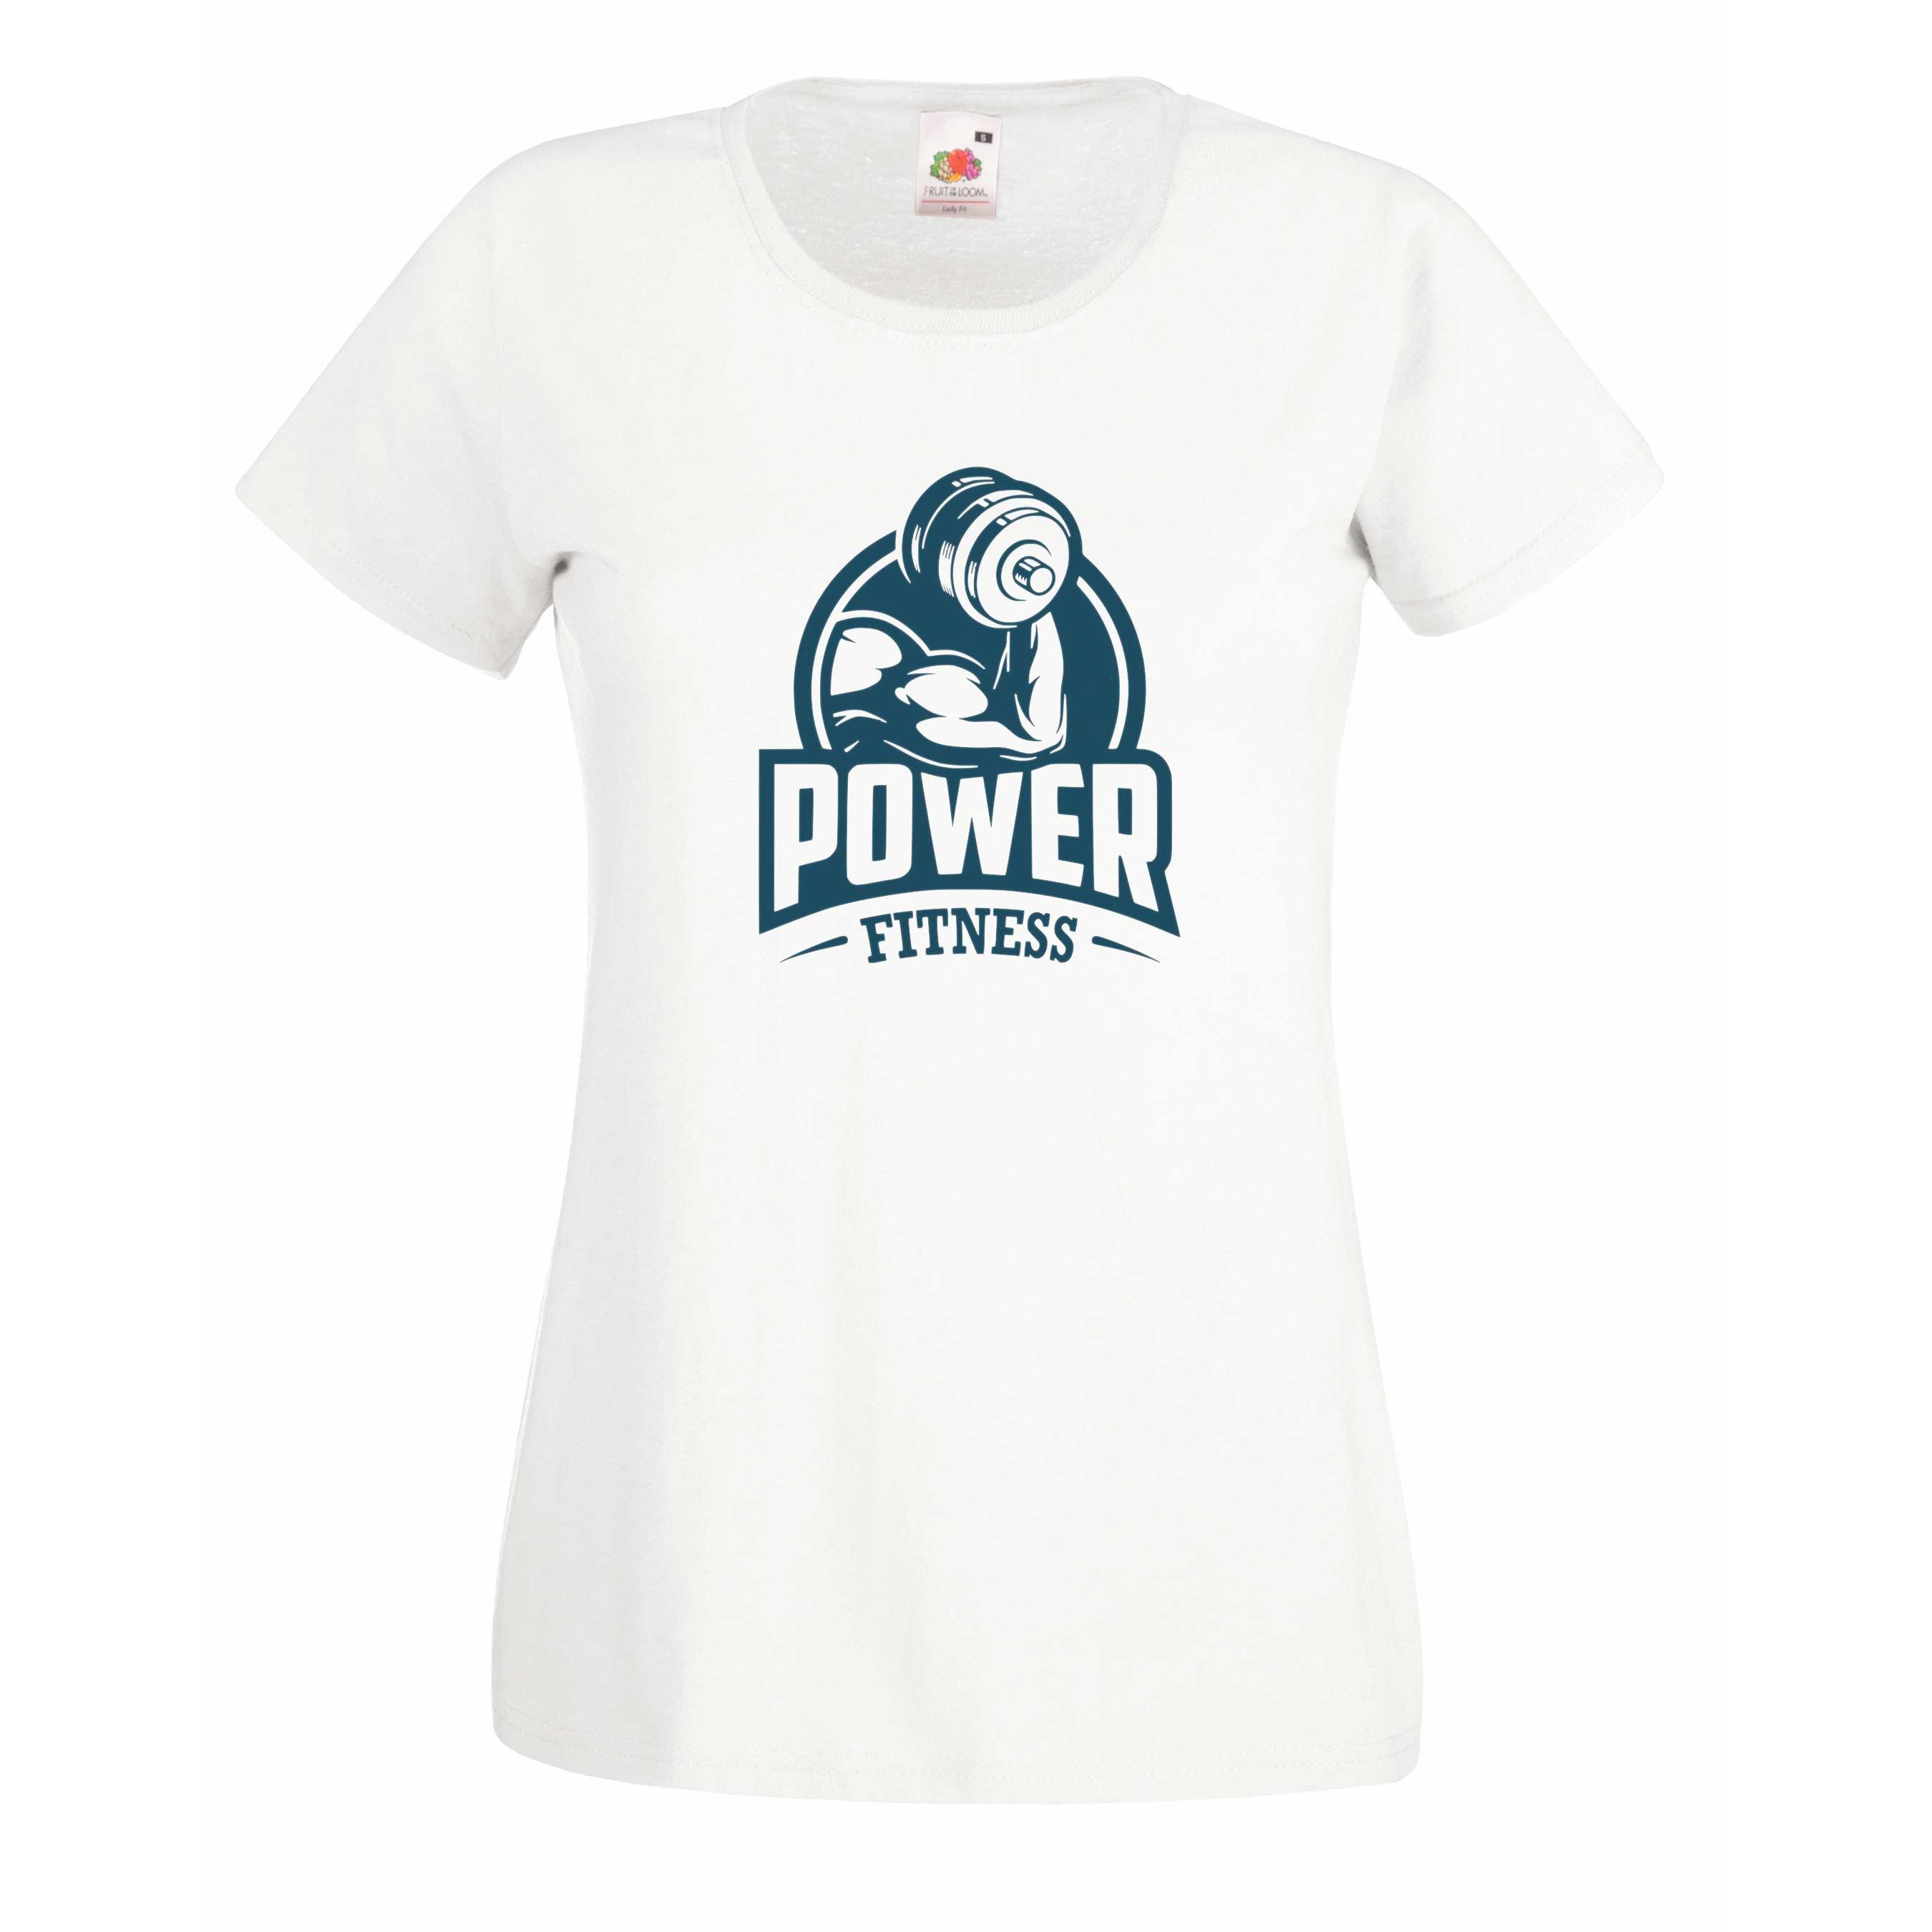 Power Fitness design for t-shirt, hoodie & sweatshirt